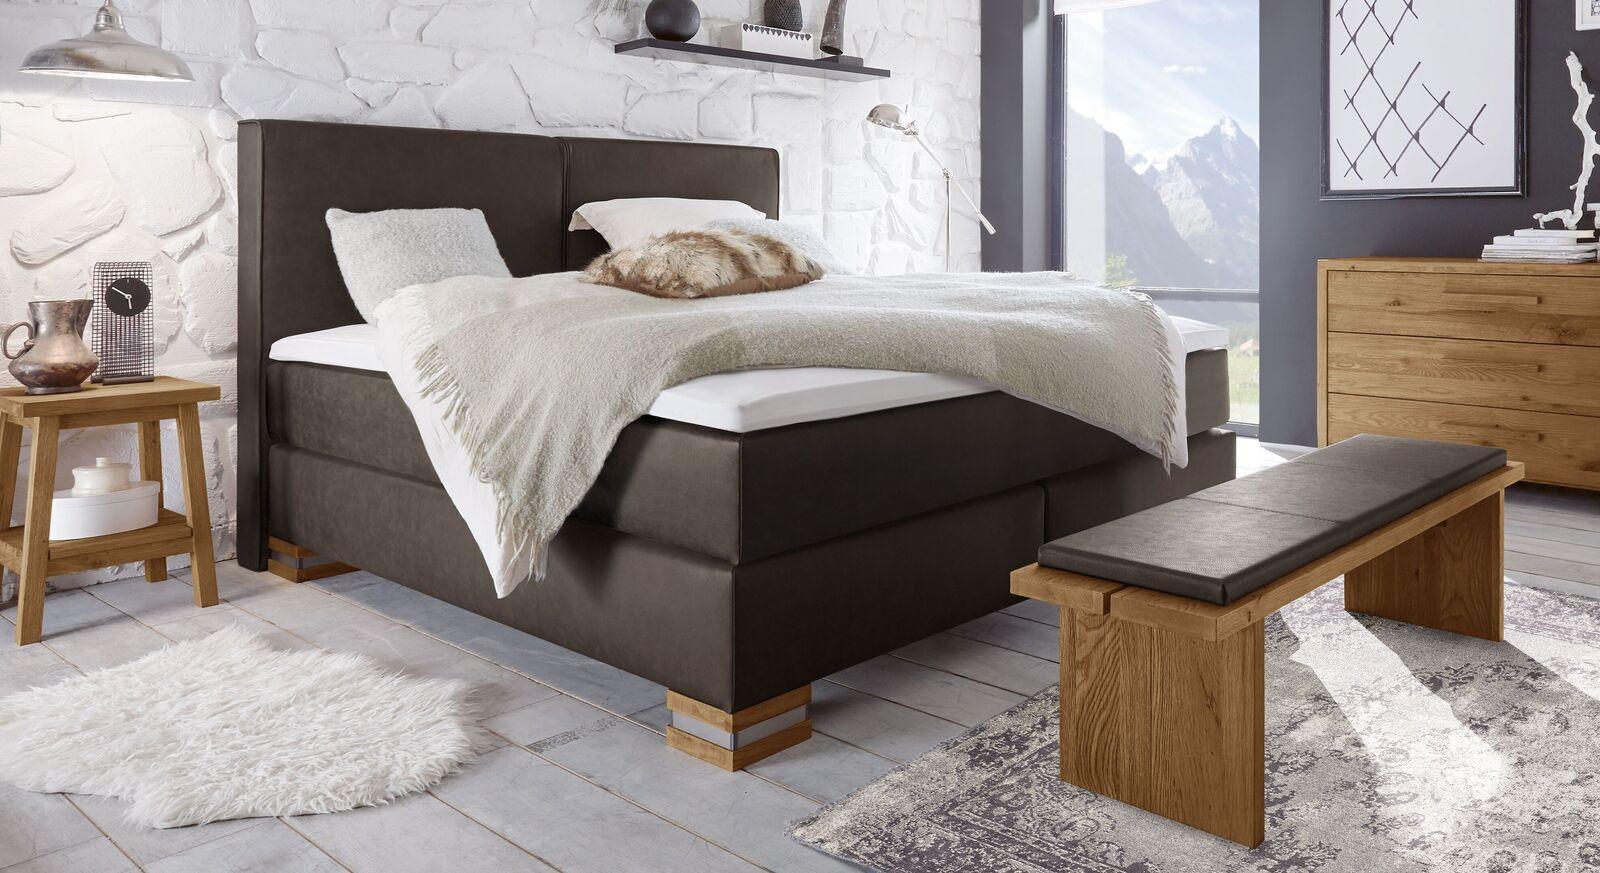 Boxspringbett Tholen mit einem Luxuskunstleder-Matratzenbezug